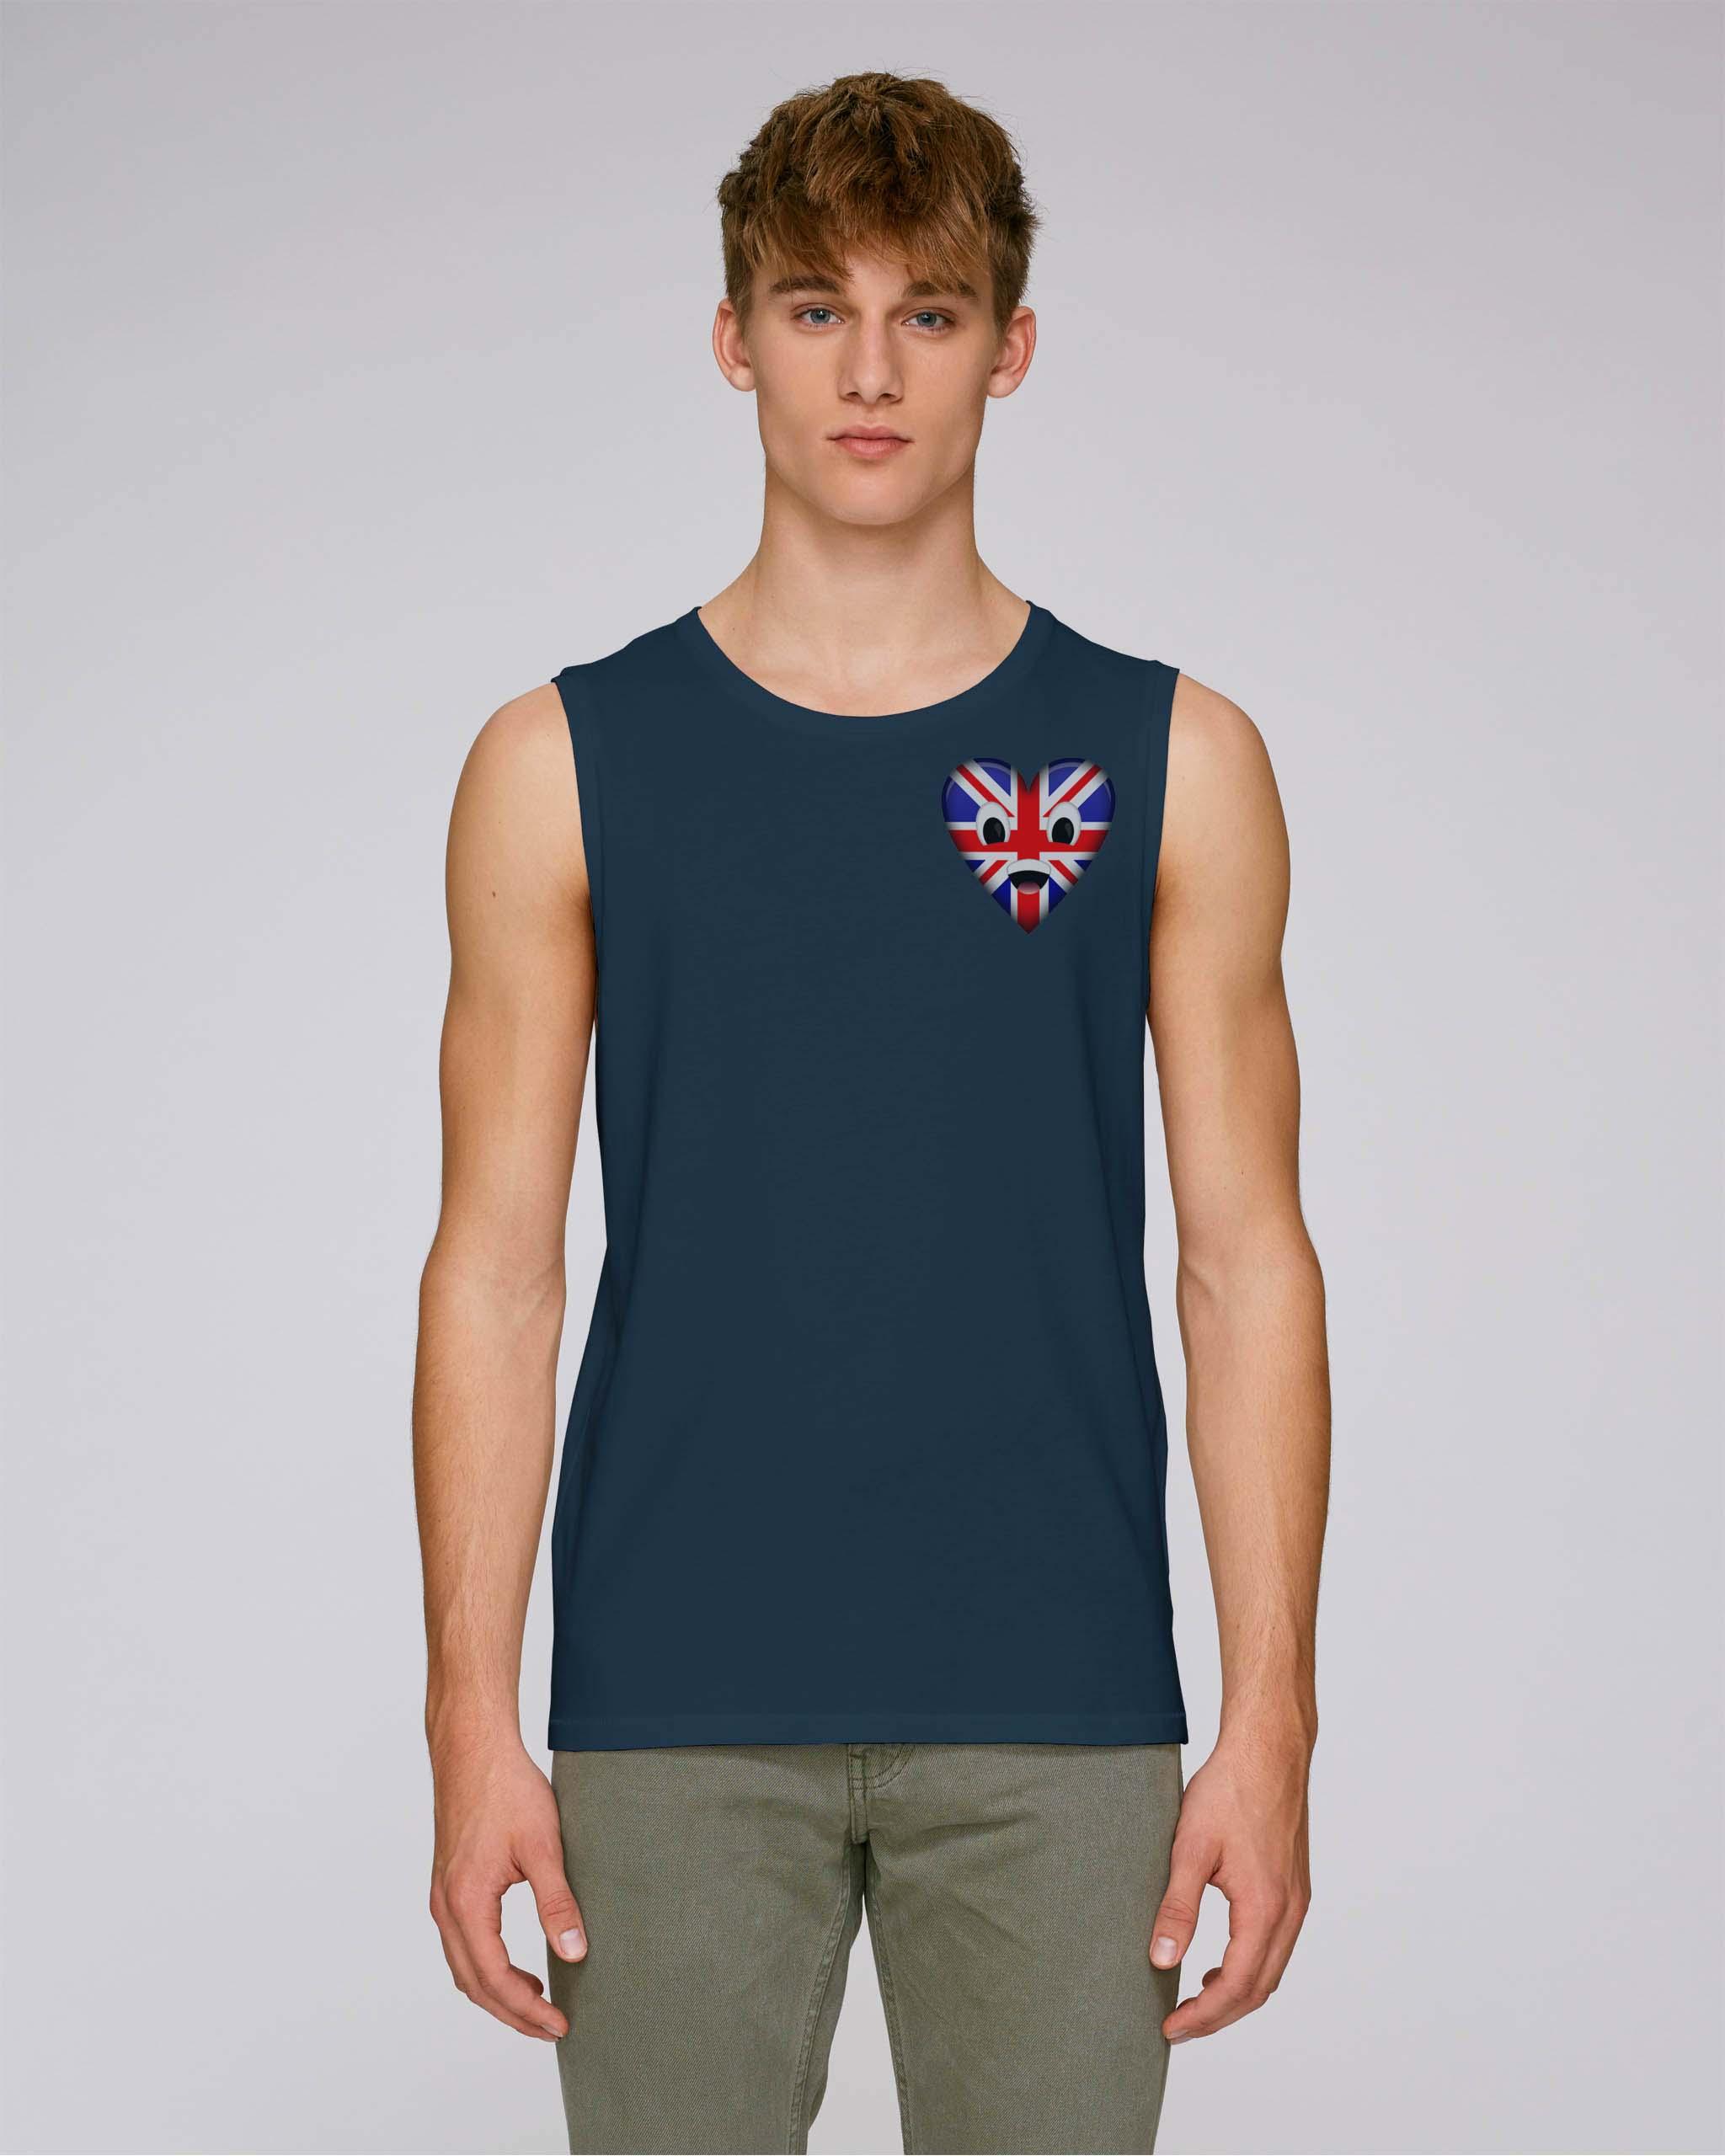 T-shirt bio bleu royal sombre manche courte homme - uk tee